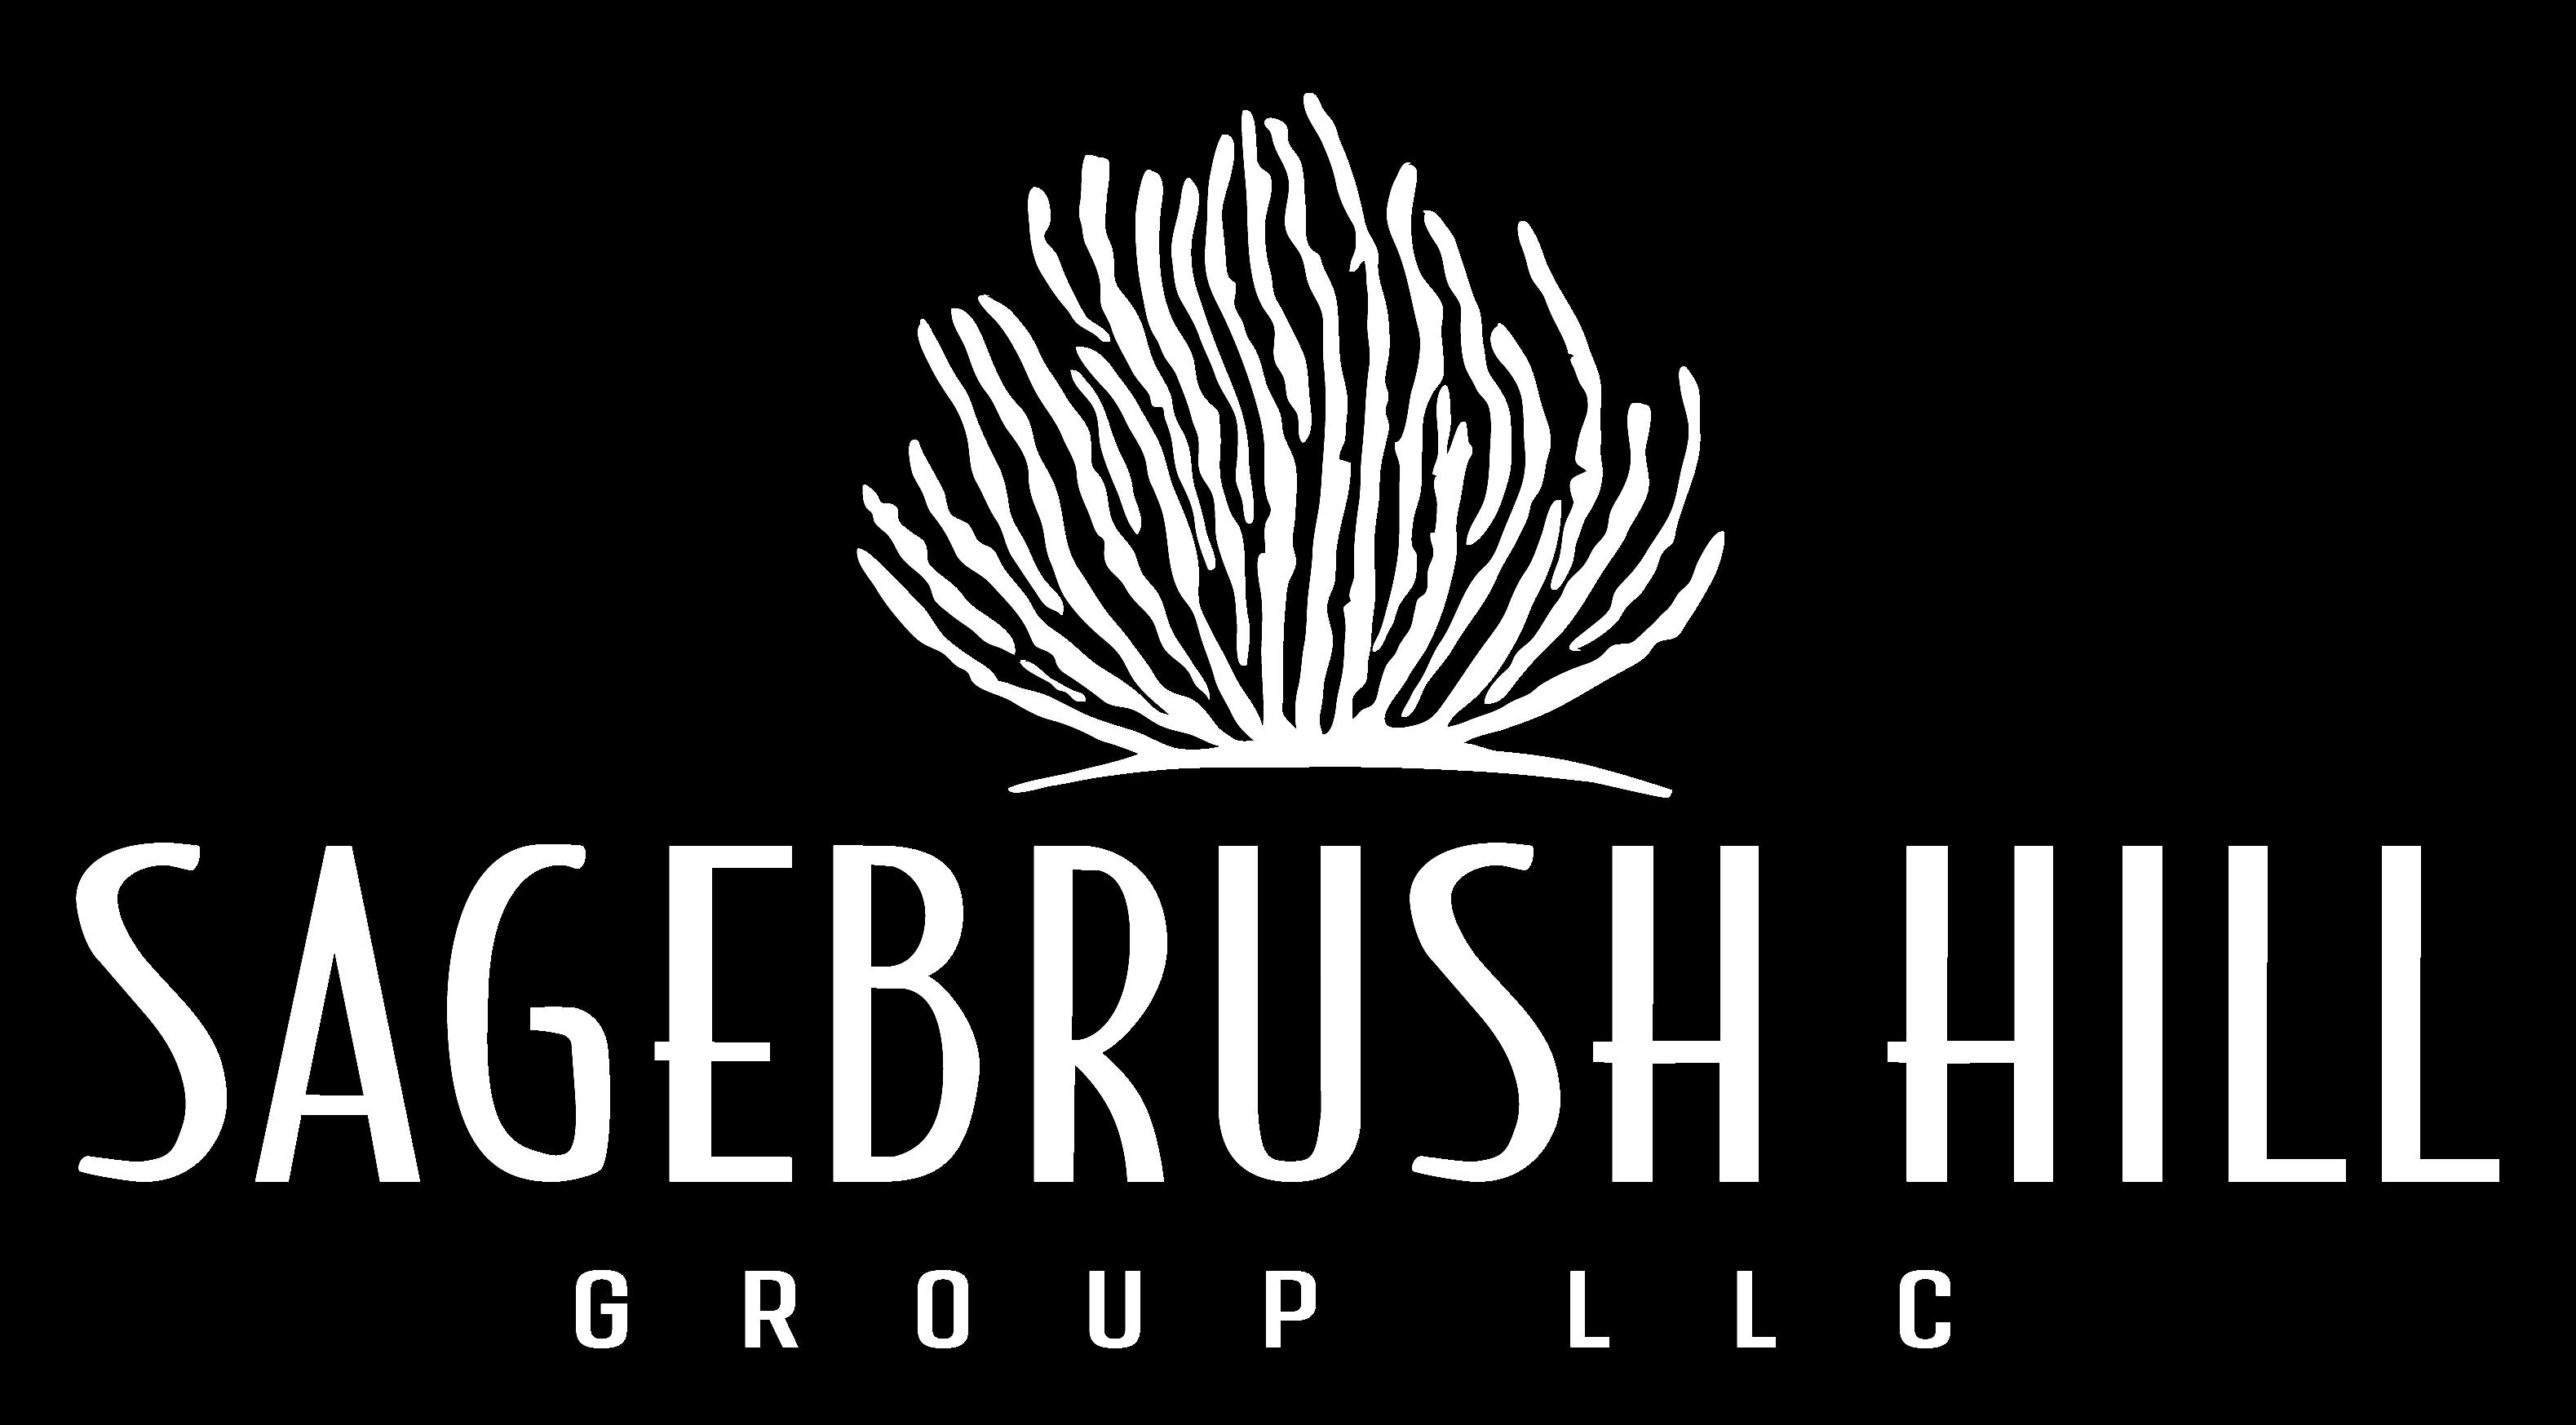 Sagebrush Hill Group, LLC